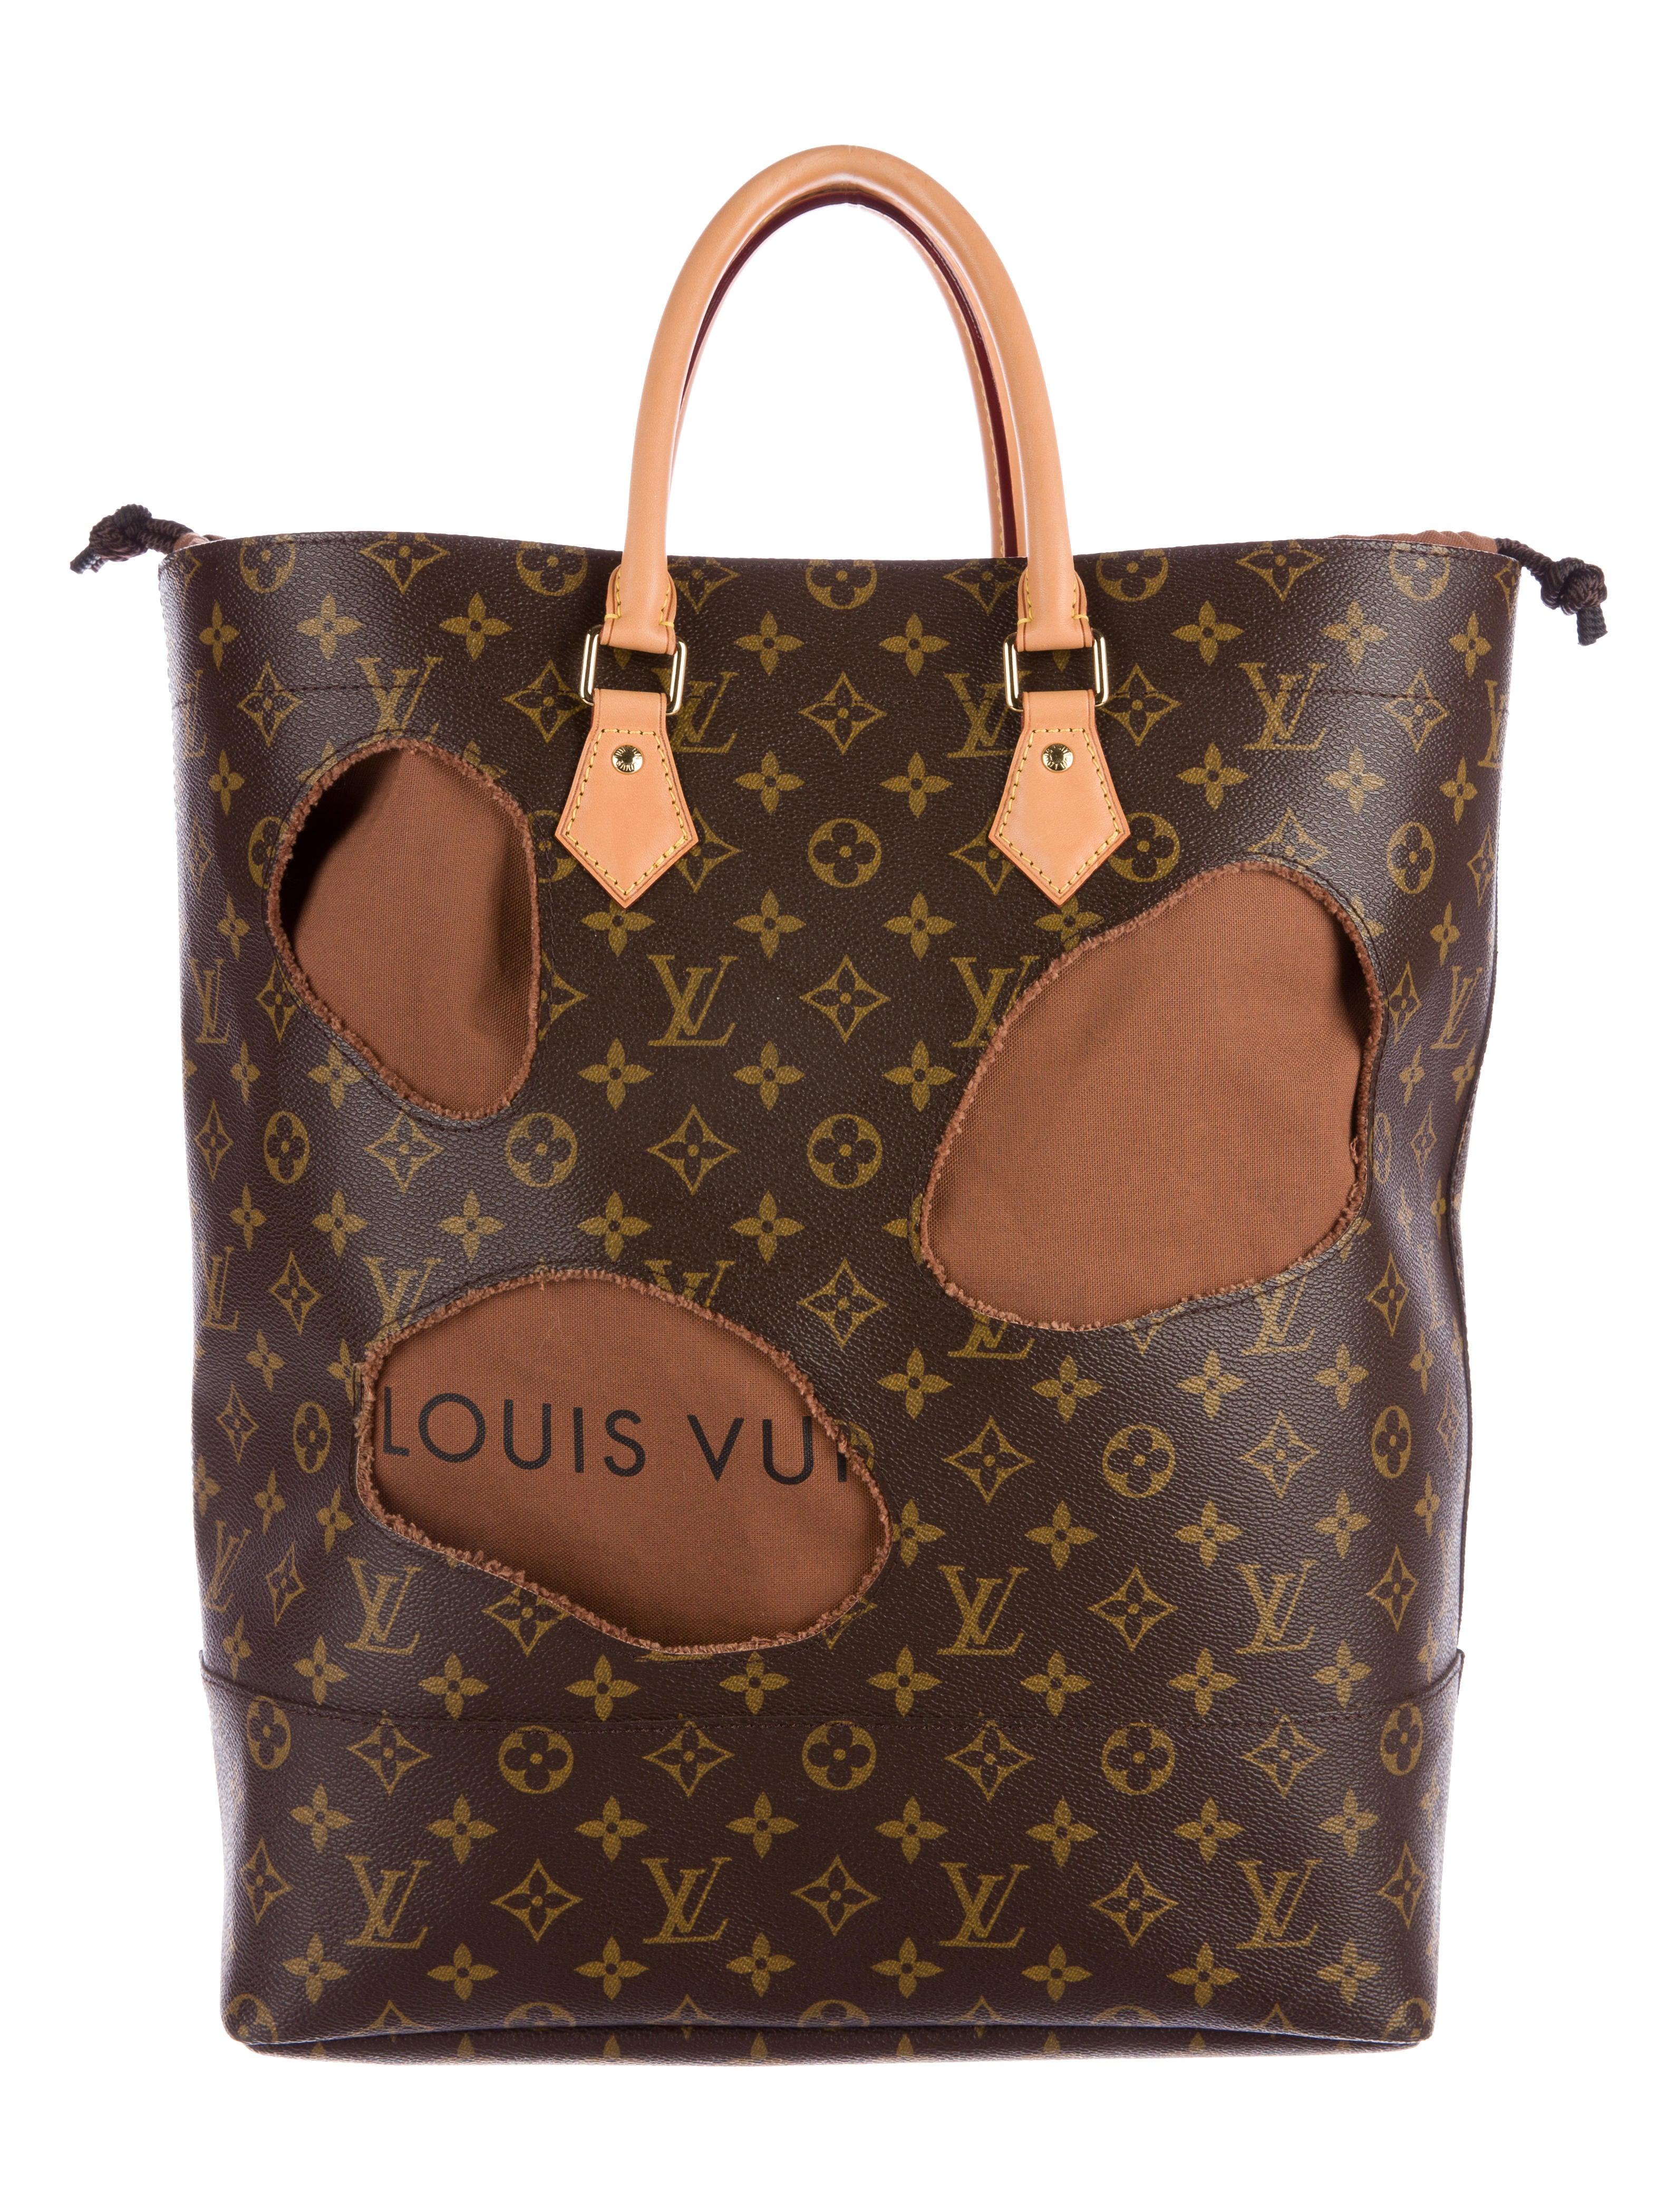 7f18fedcdaf1 Louis Vuitton Rei Kawakubo Monogram Bag With Holes - Bags - LOU94890 ...